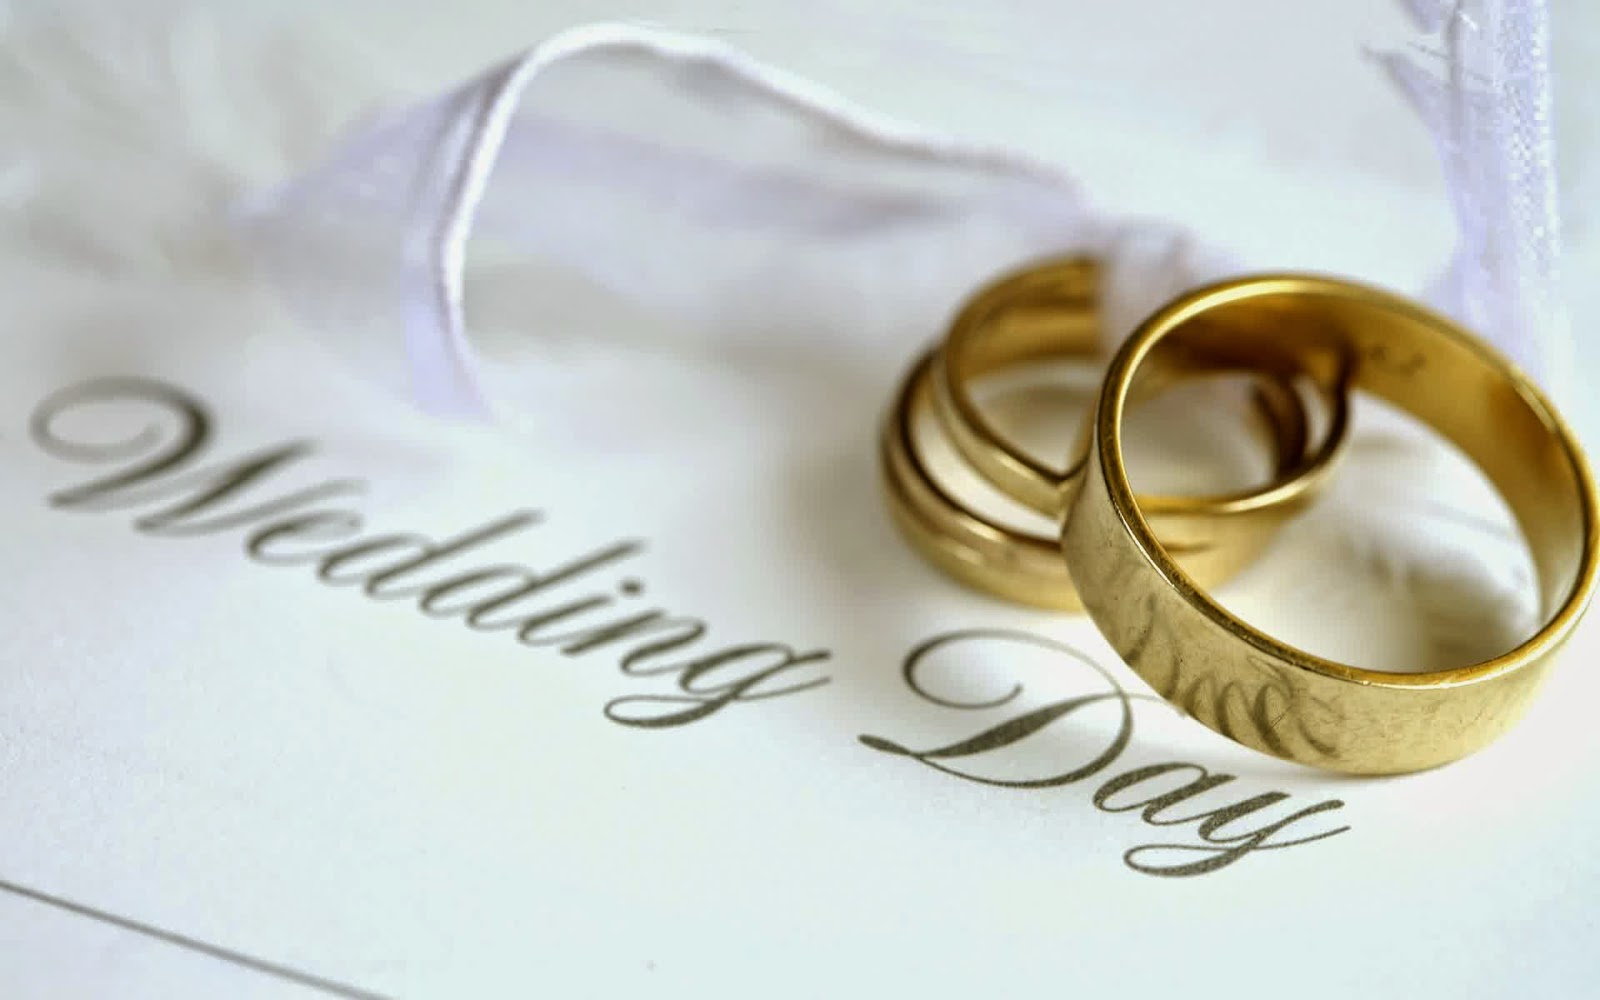 arti mimpi cincin kebesaran, arti mimpi cincin yang dipakai patah, arti mimpi cincin tunangan hilang, arti mimpi cincin terbelah dua, arti mimpi cincin togel, arti mimpi cincin berlian, arti mimpi cincin jatuh, arti mimpi cincin diambil orang, arti mimpi cincin emas, arti mimpi cincin patah,